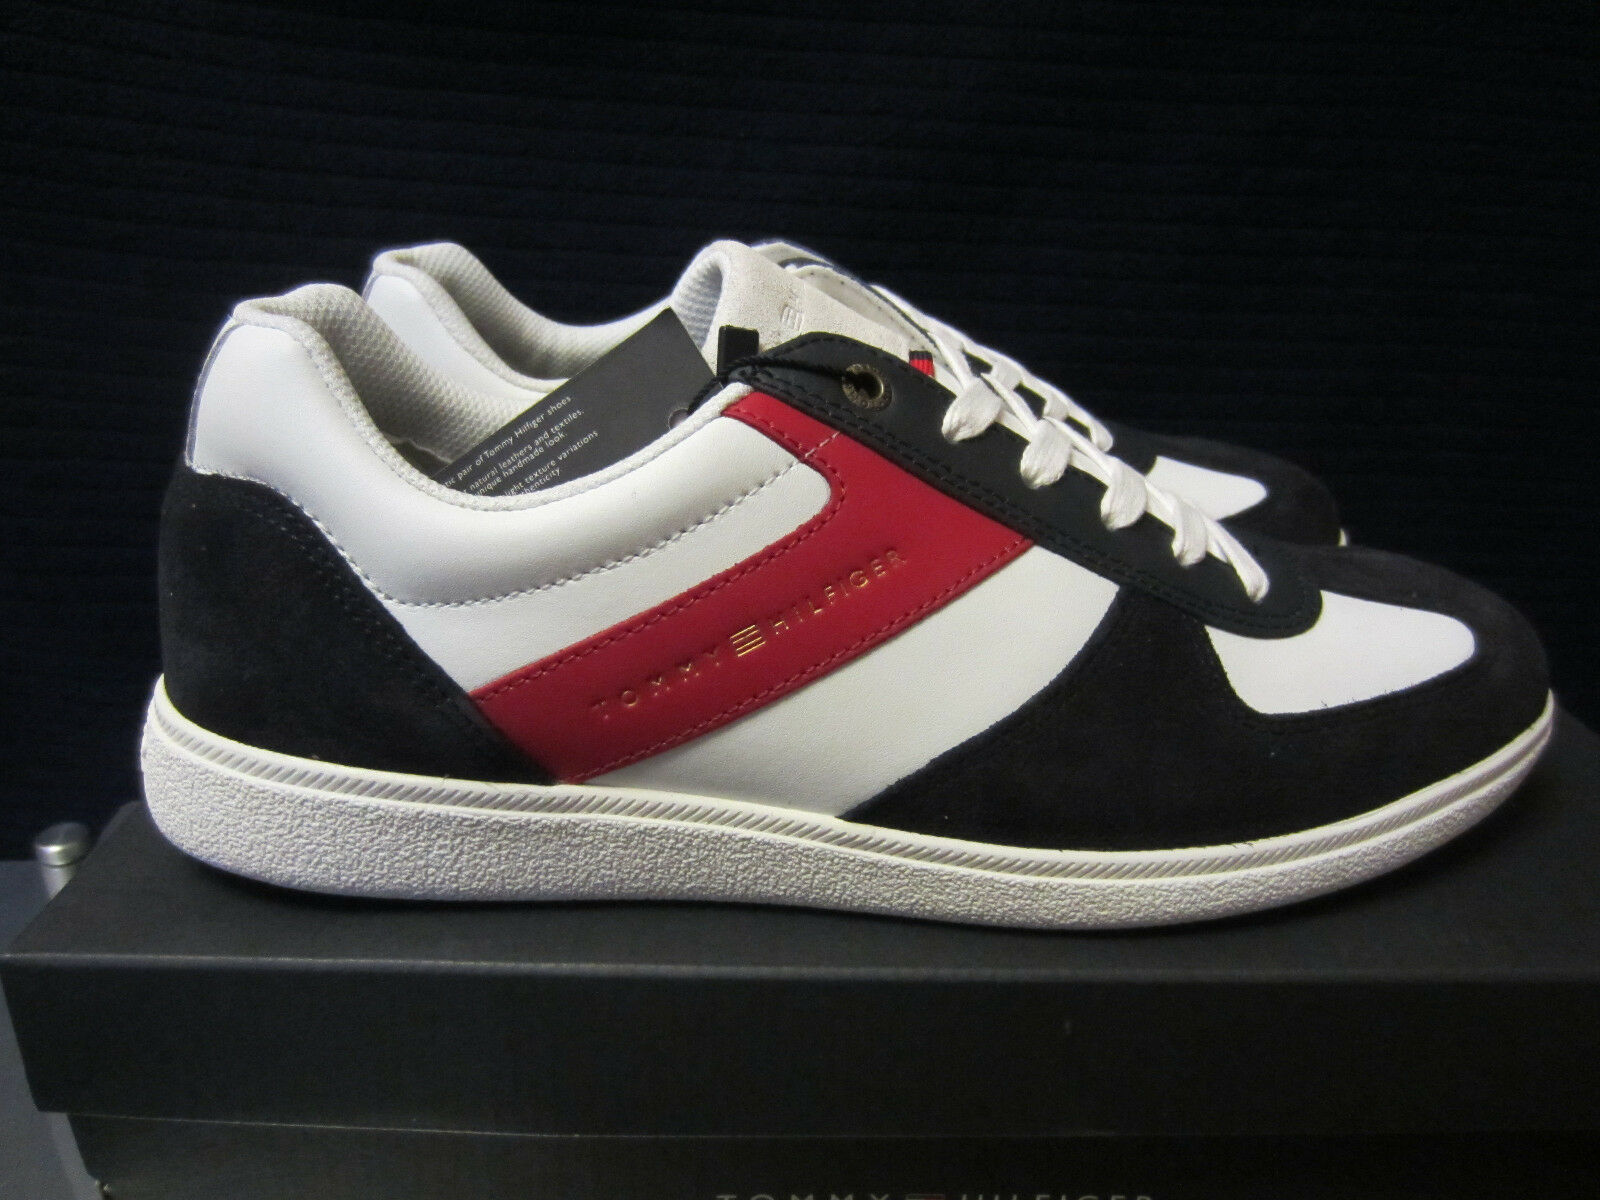 Tommy Hilfiger D2285ANNY 1C1 Sneakers Weiß-blau-rot Gr.44, 45. Neu und OVP